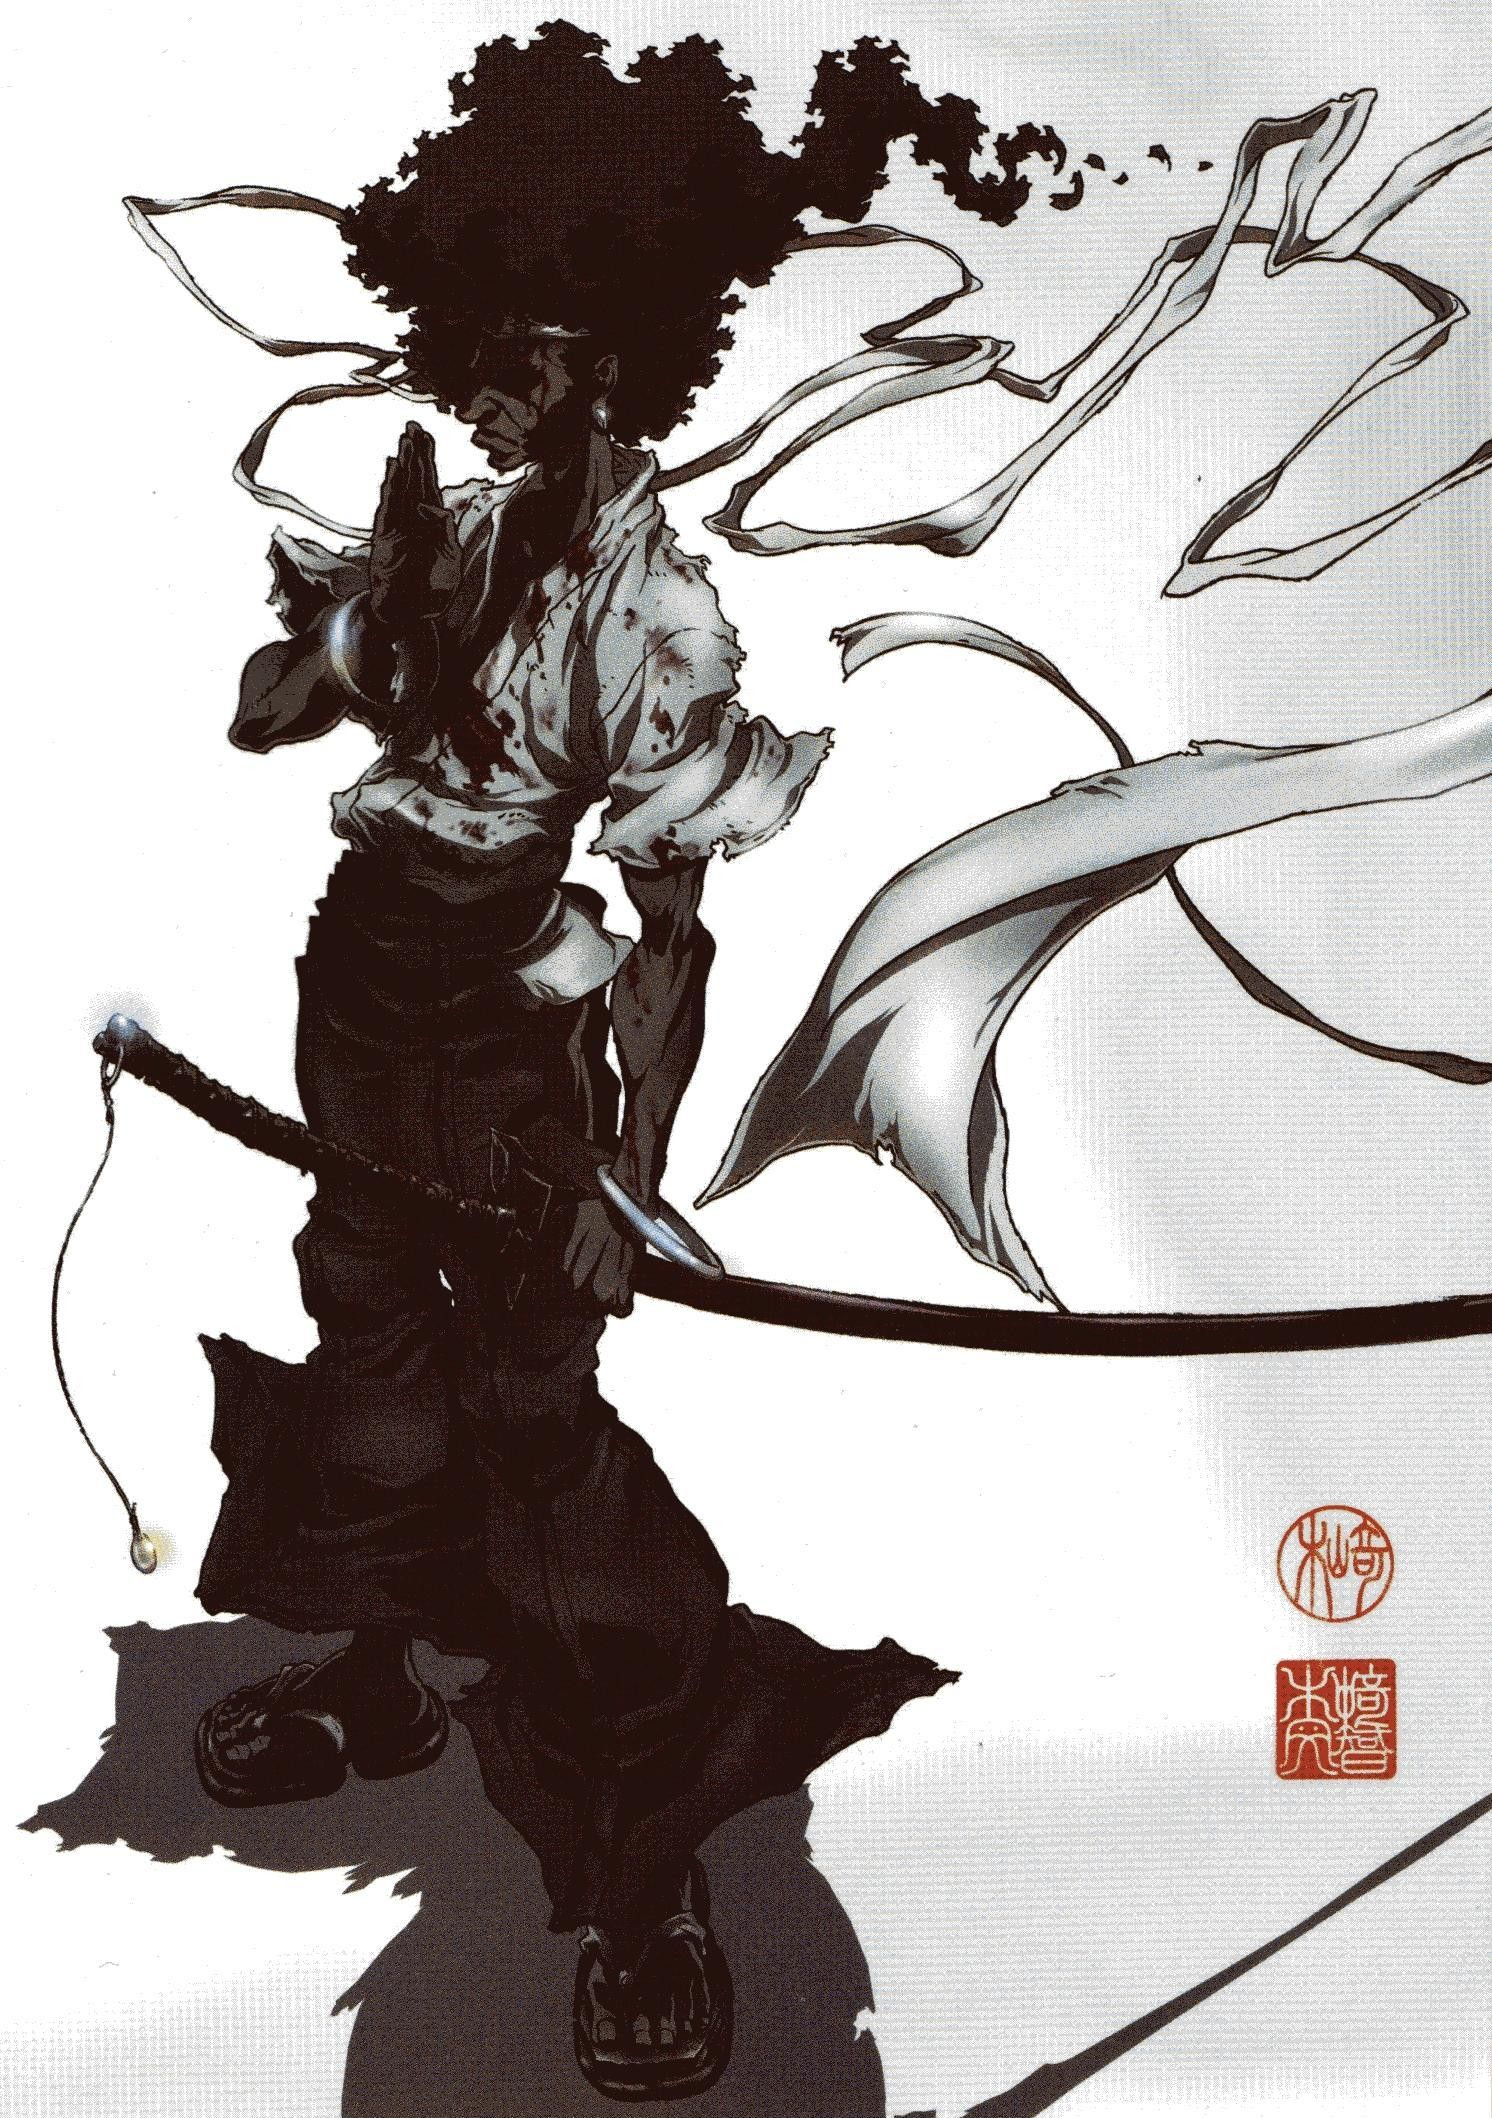 142 Afro Samurai Wallpaper Hd